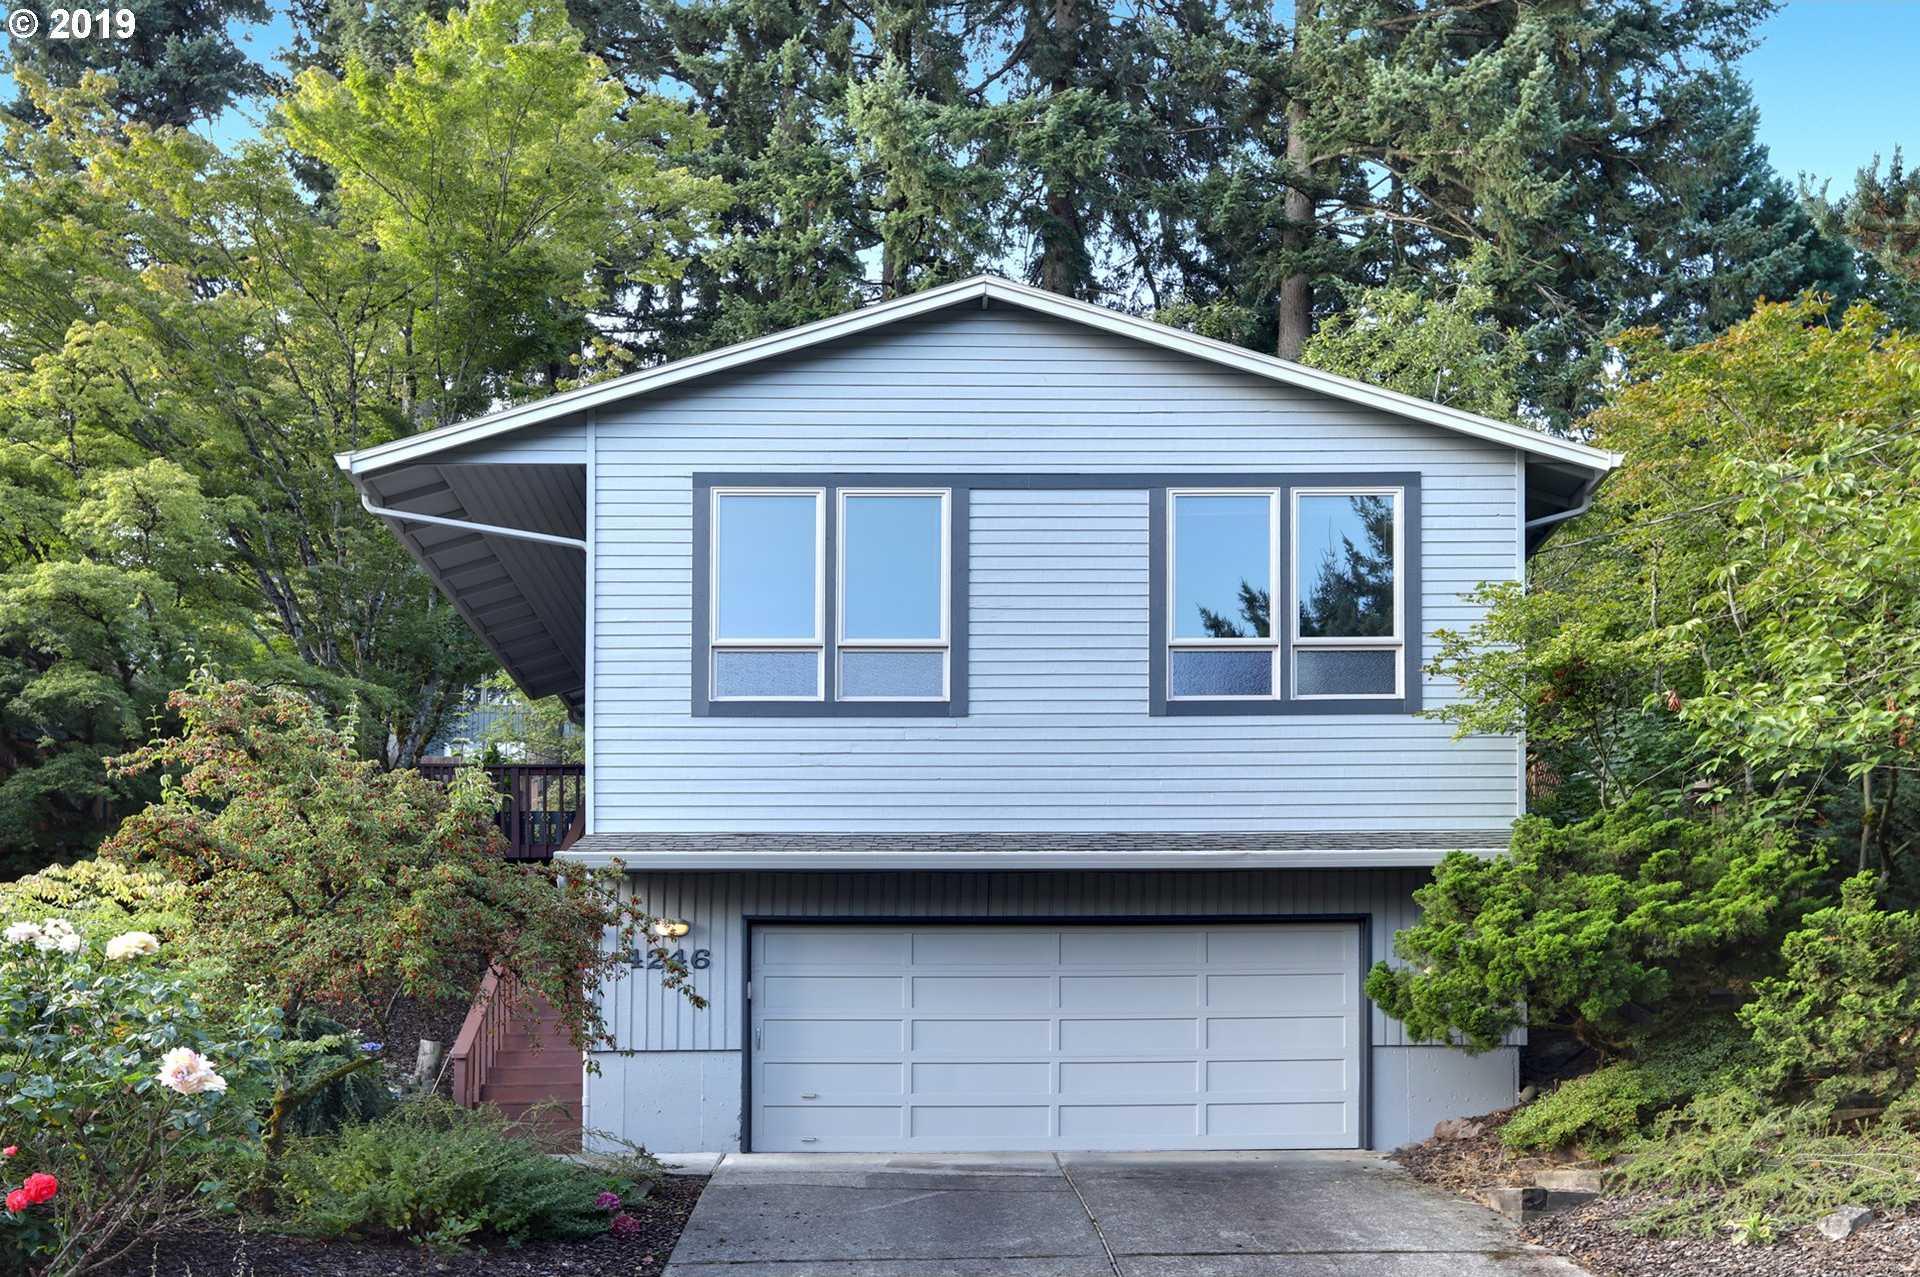 $405,000 - 3Br/2Ba -  for Sale in West Portland Park, Portland